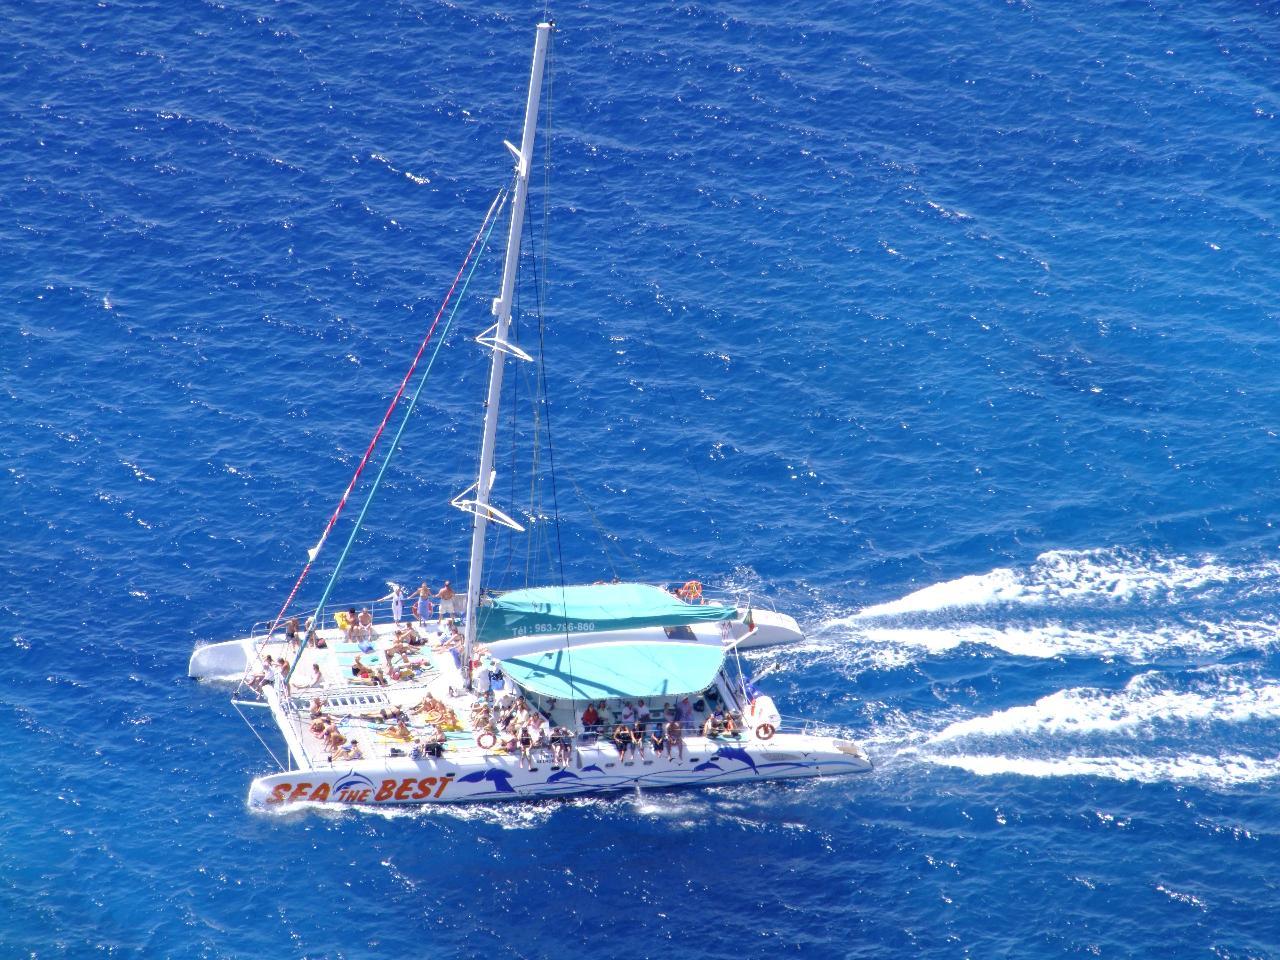 Full Day Cruise to Benagil, Ponta da Piedade and West Coast